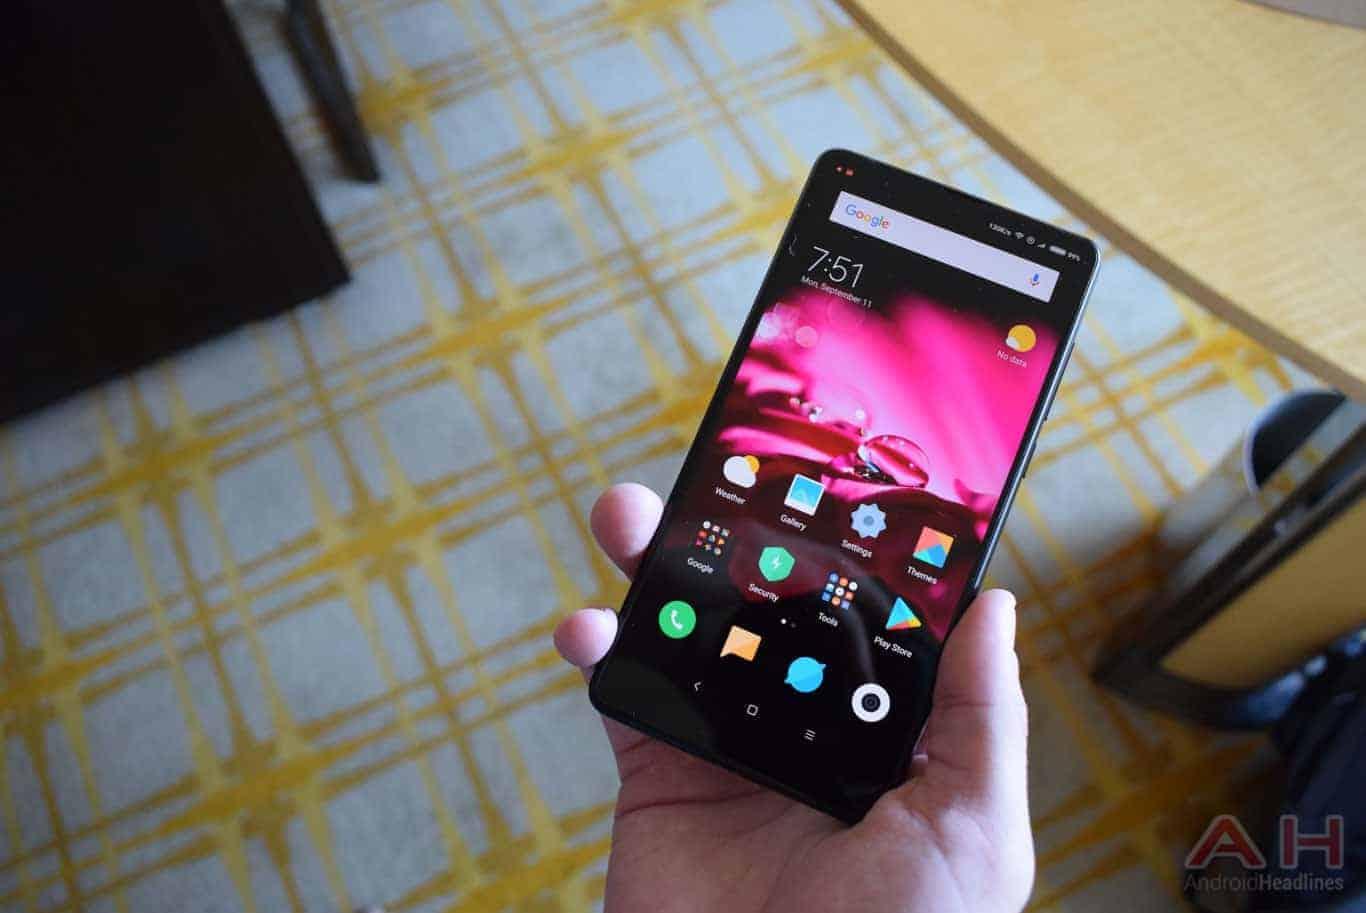 Xiaomi Mi MIX 2 Hands On AM AH 16